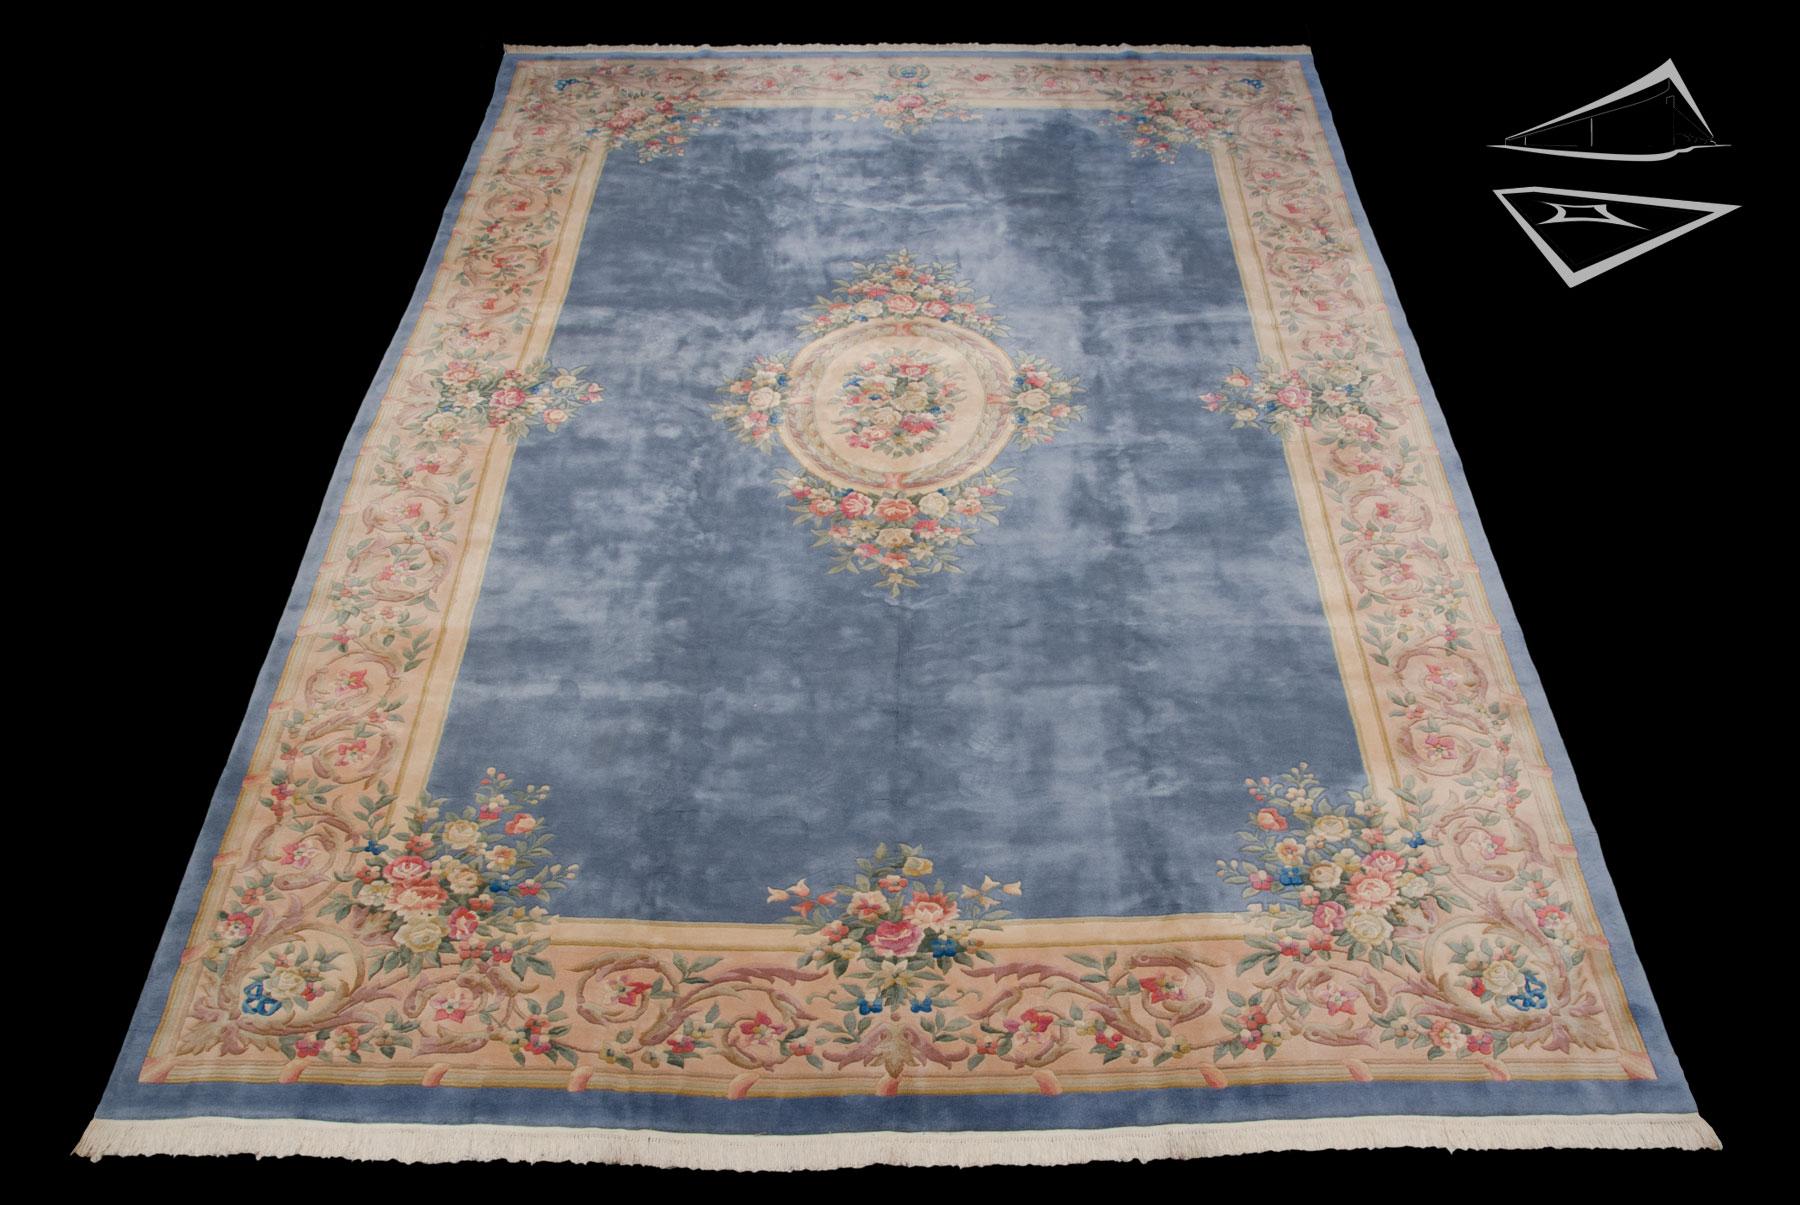 12x18 Savonnerie Design Rug Large Rugs Amp Carpets